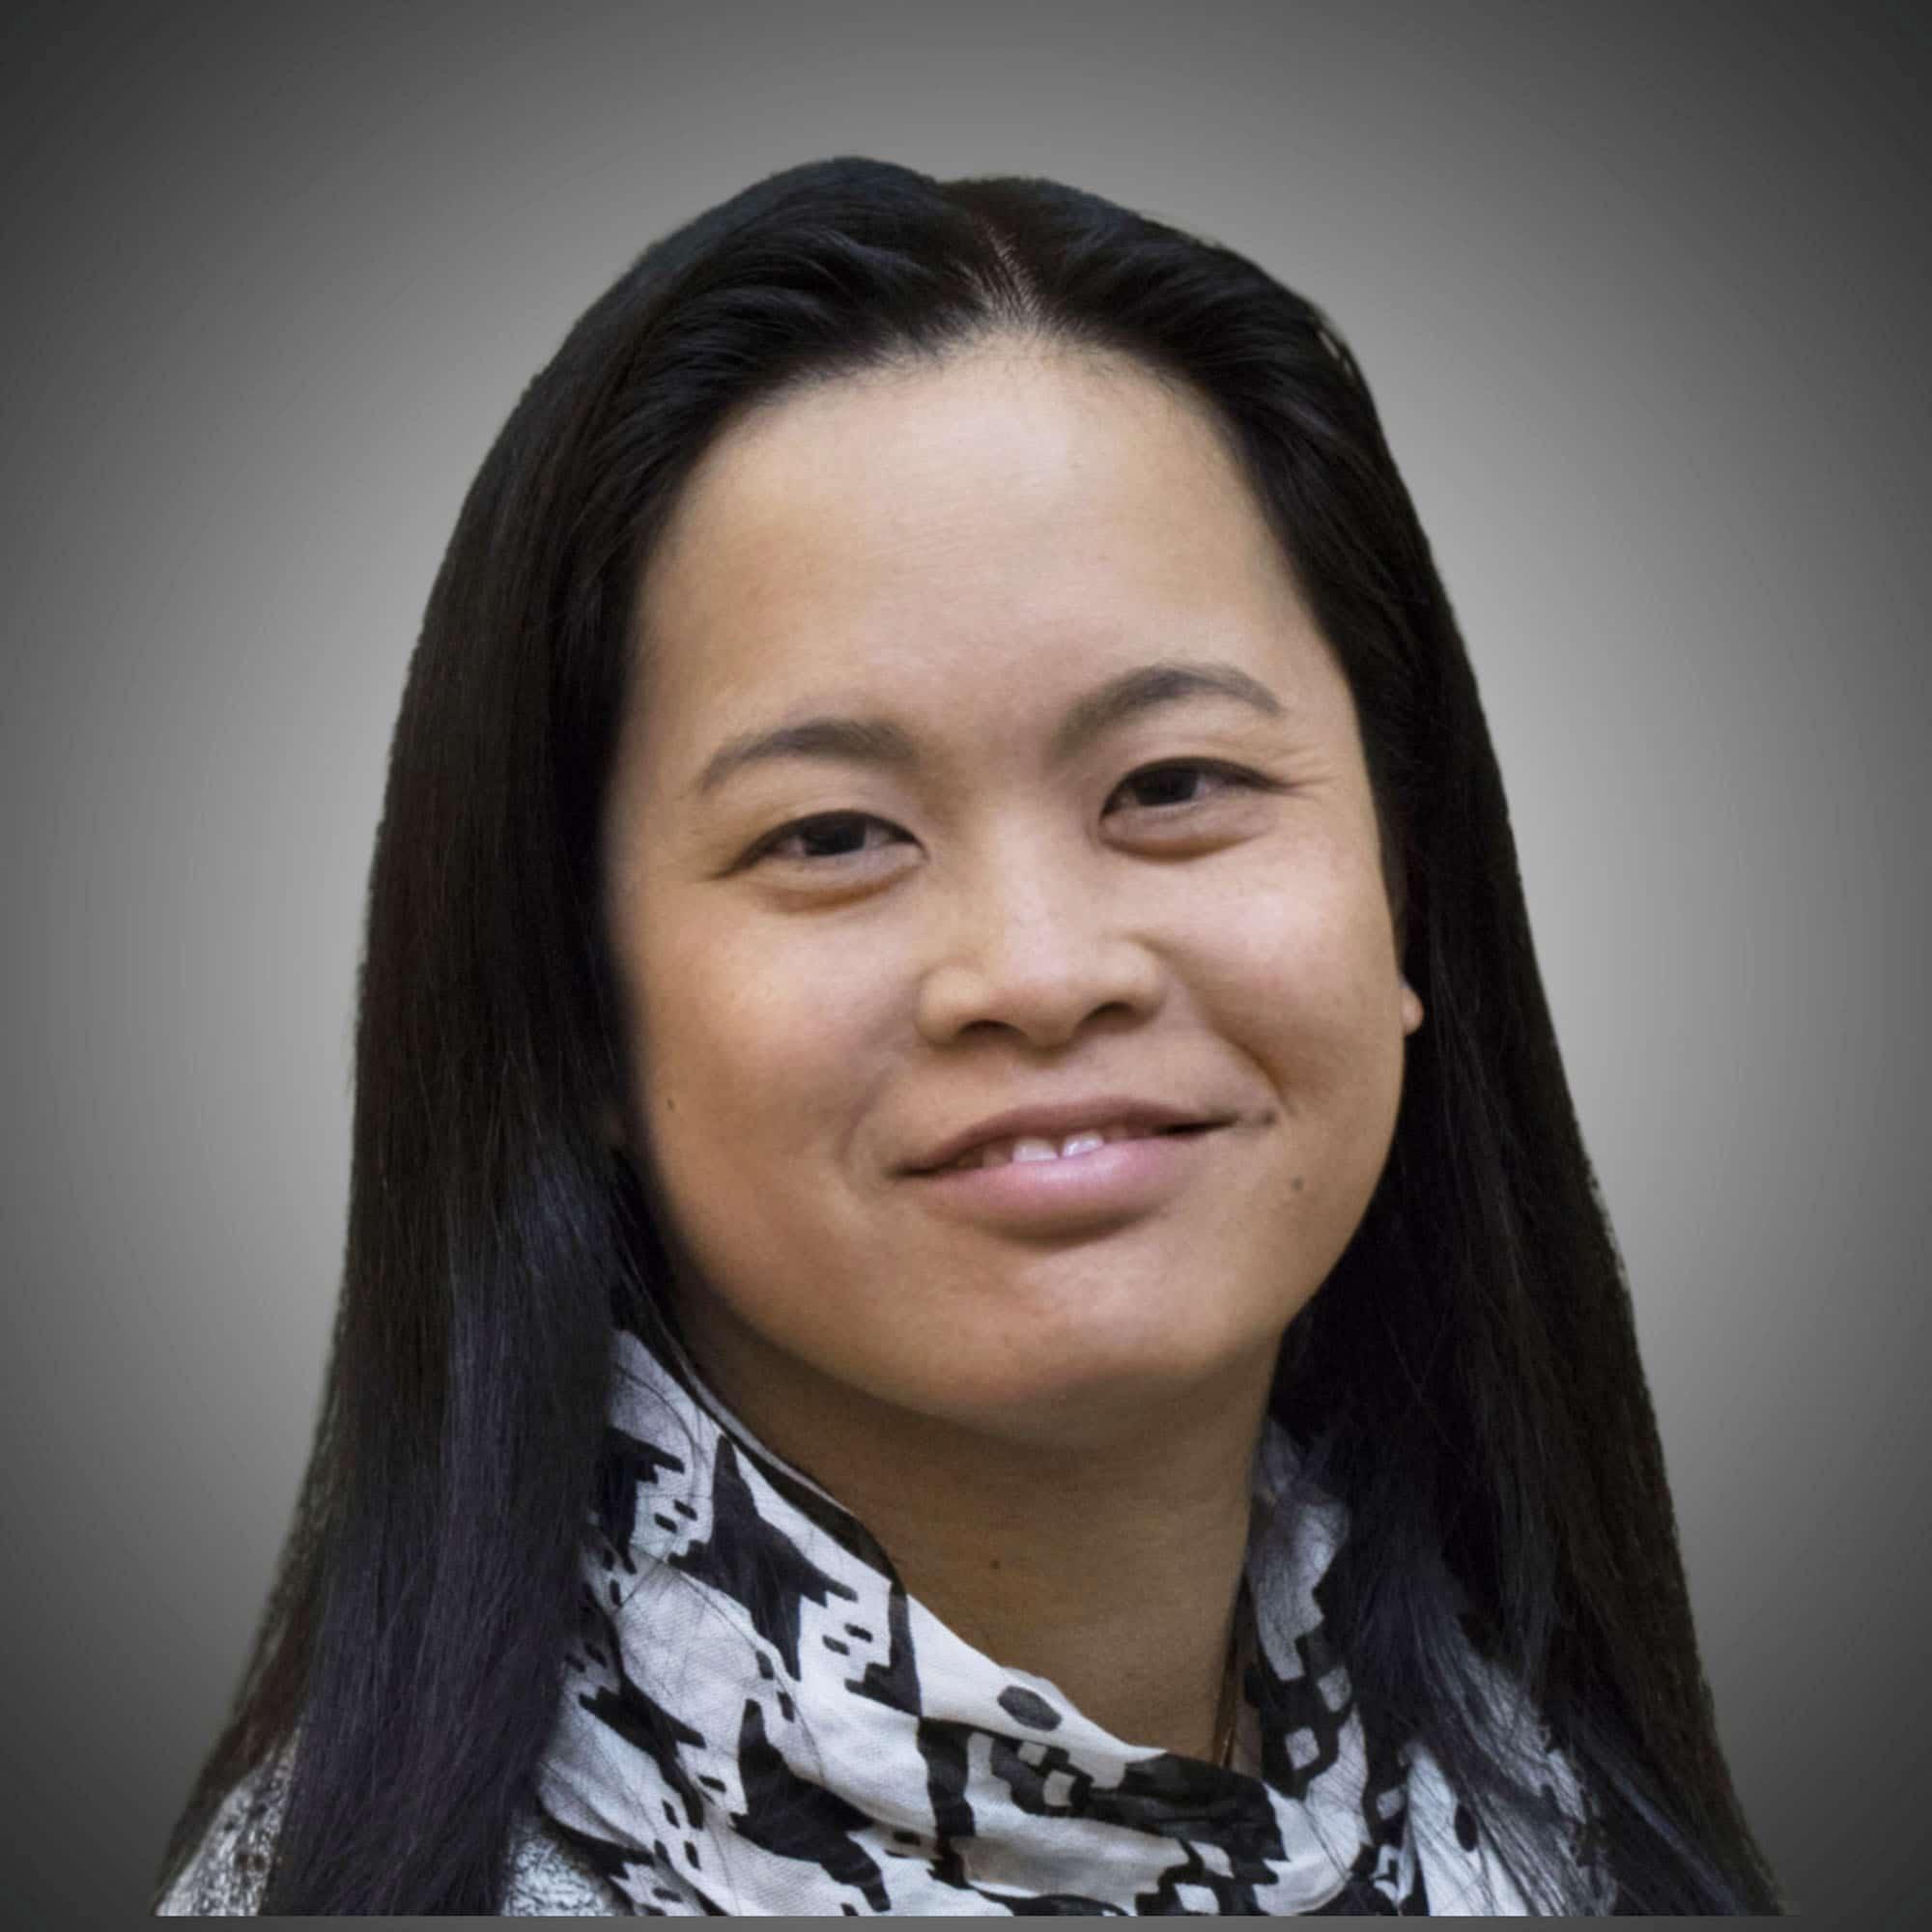 Elaina Wong